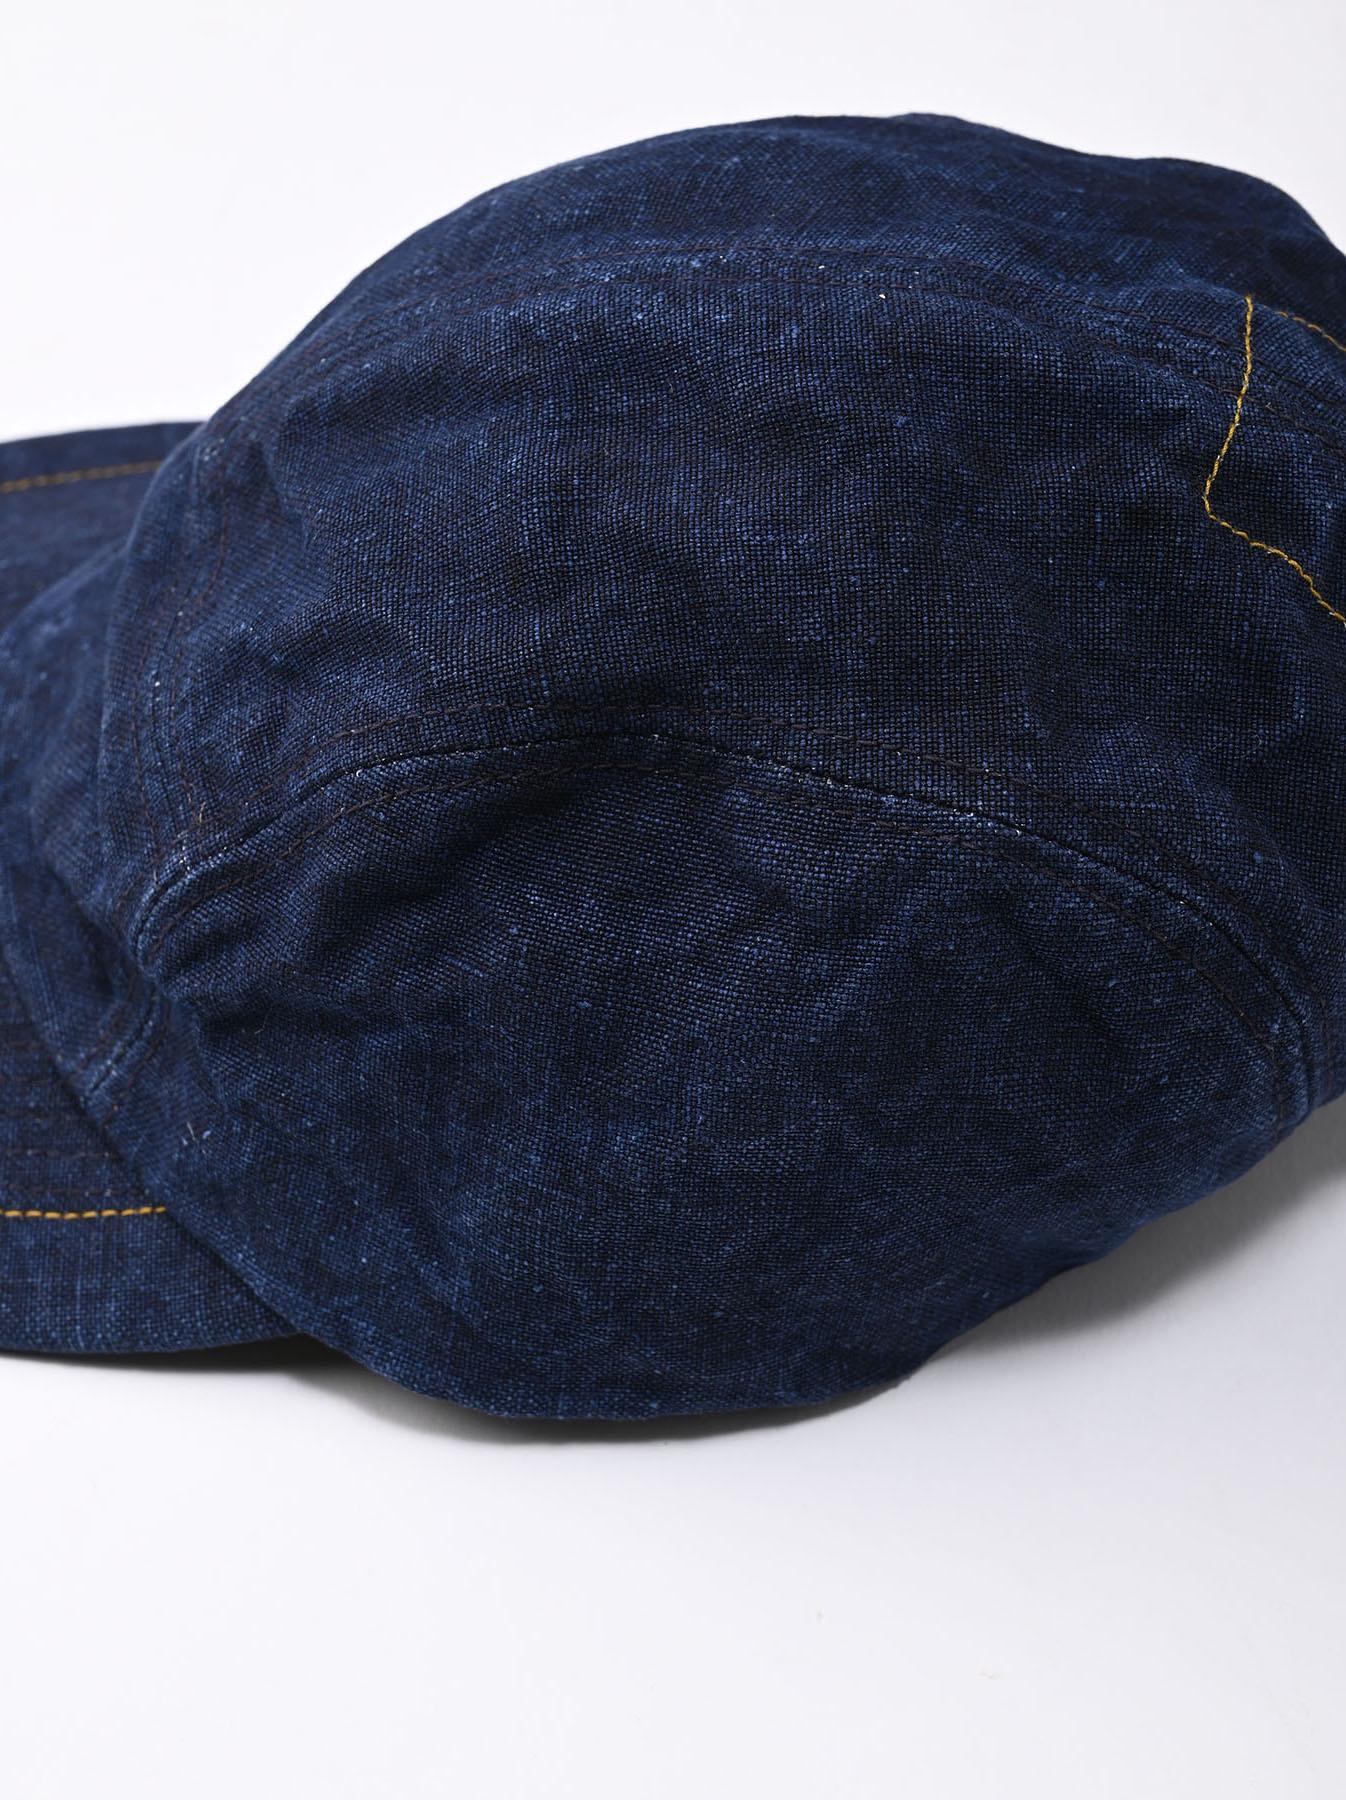 Indigo Linen Duck Cap (0421)-6